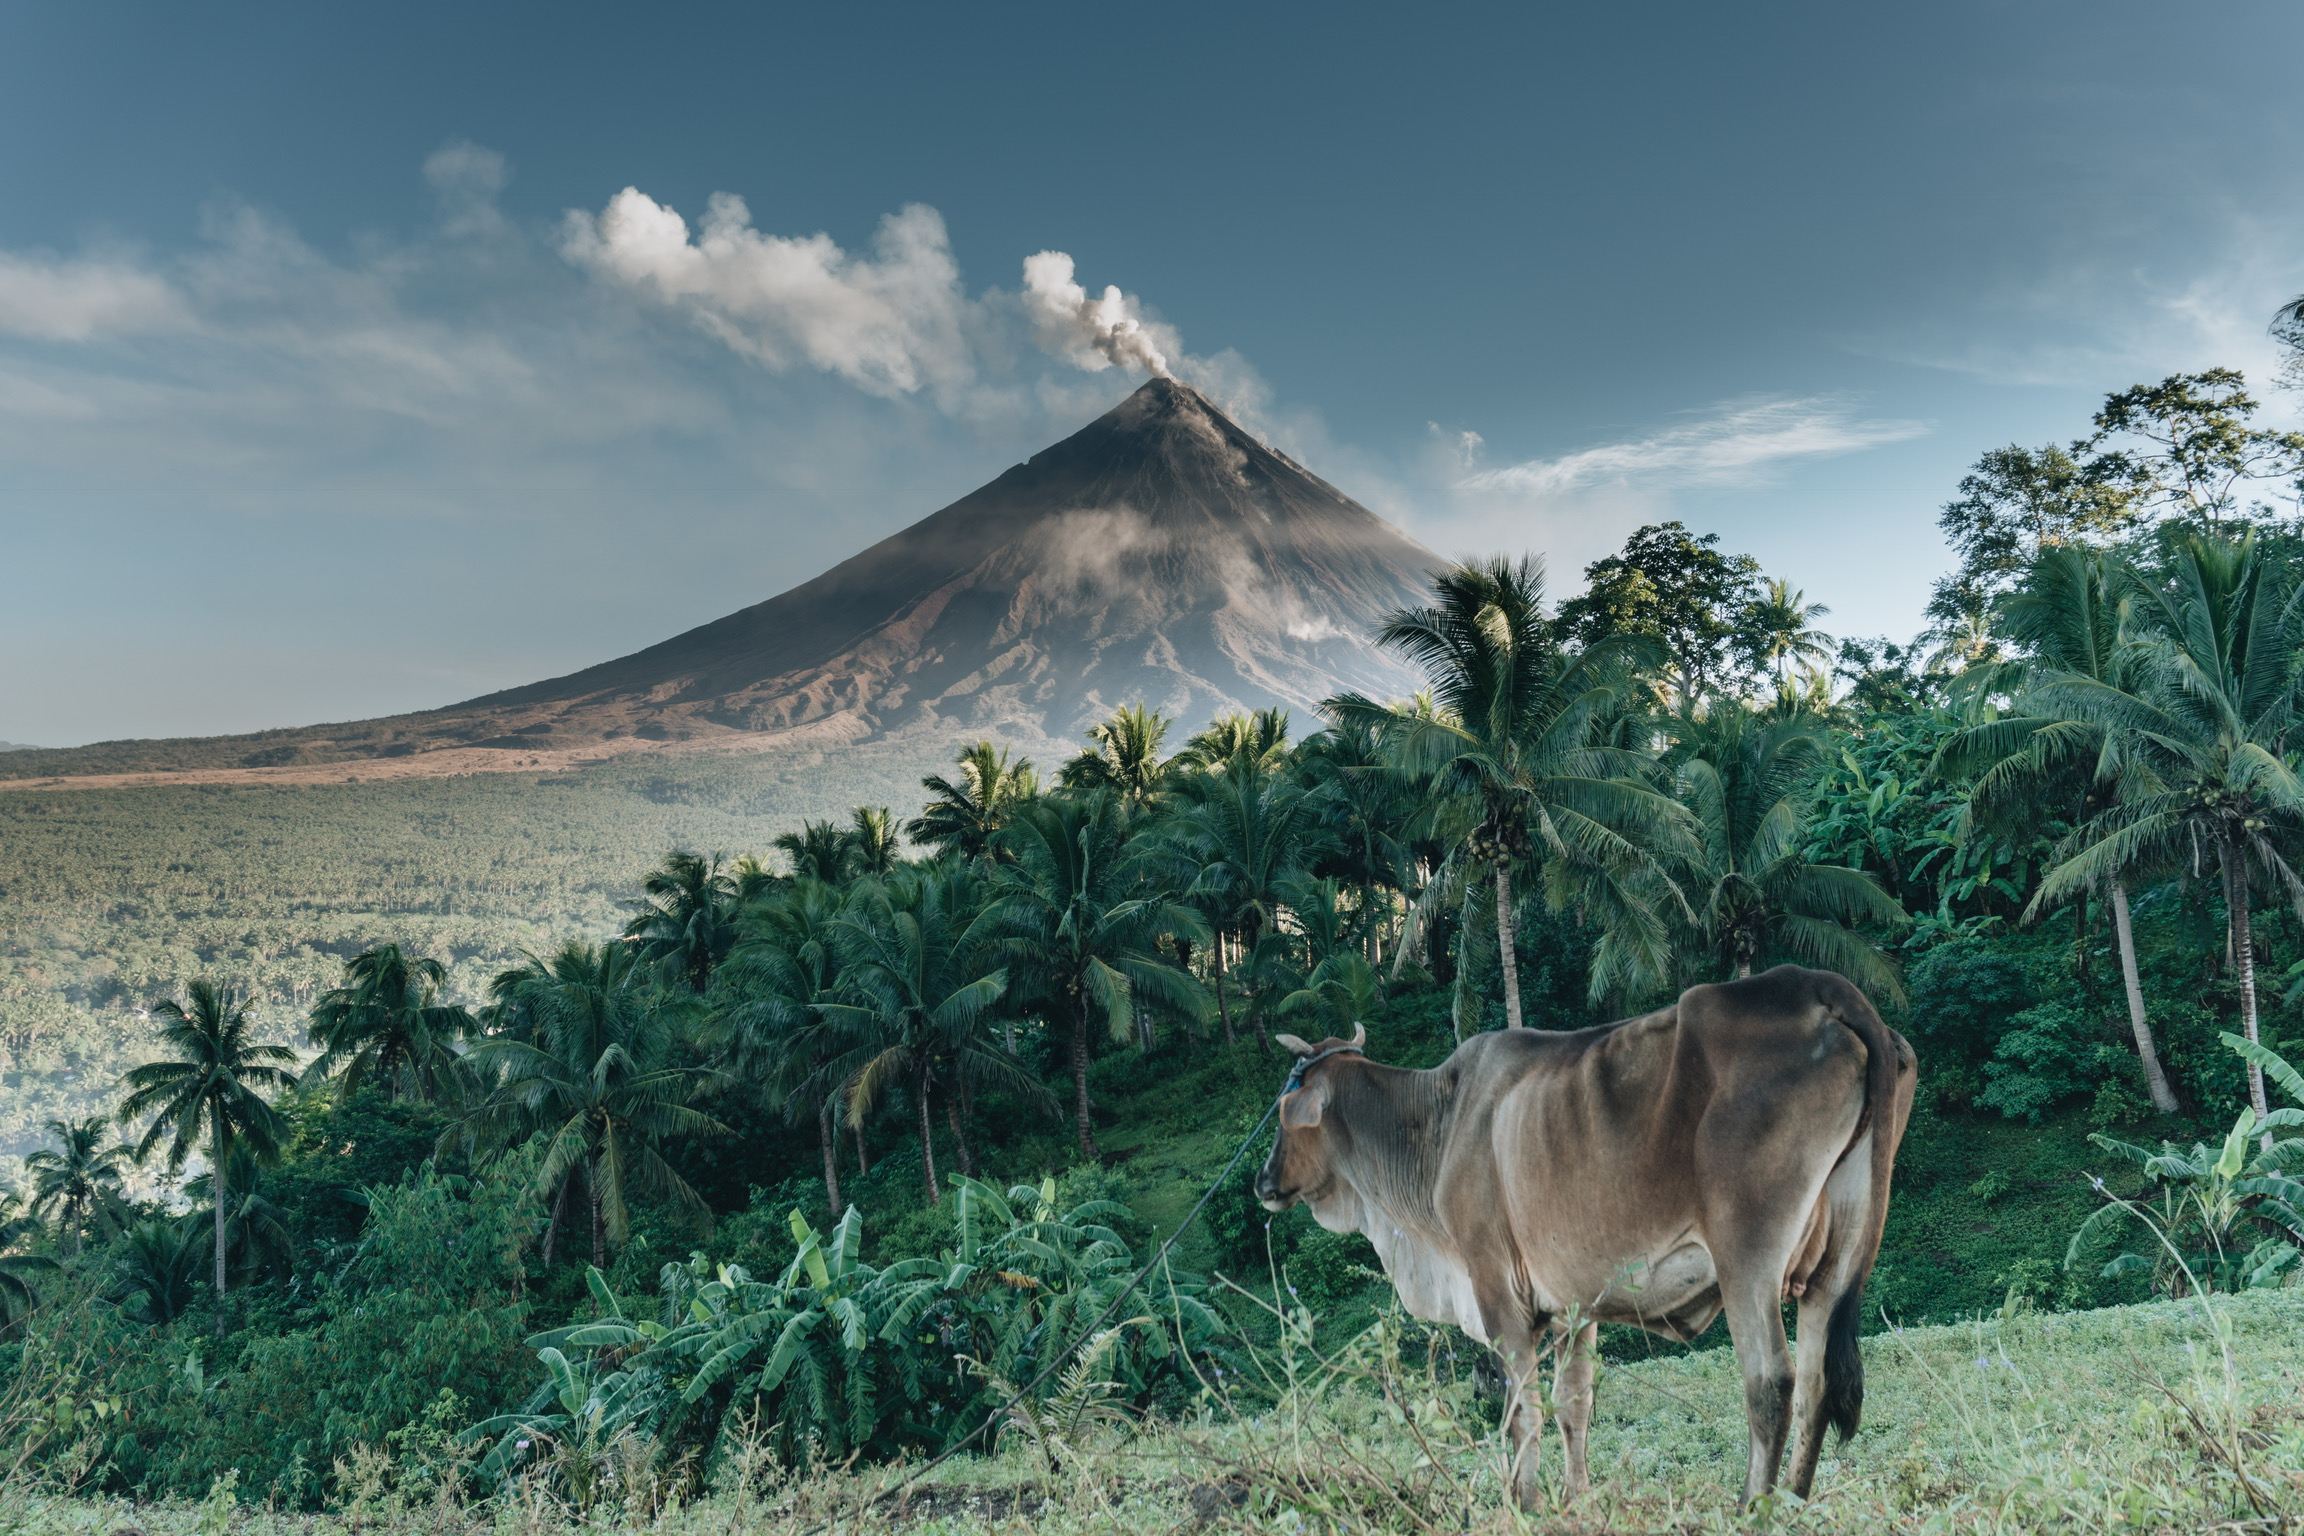 @lhermida - Albay, Philippines